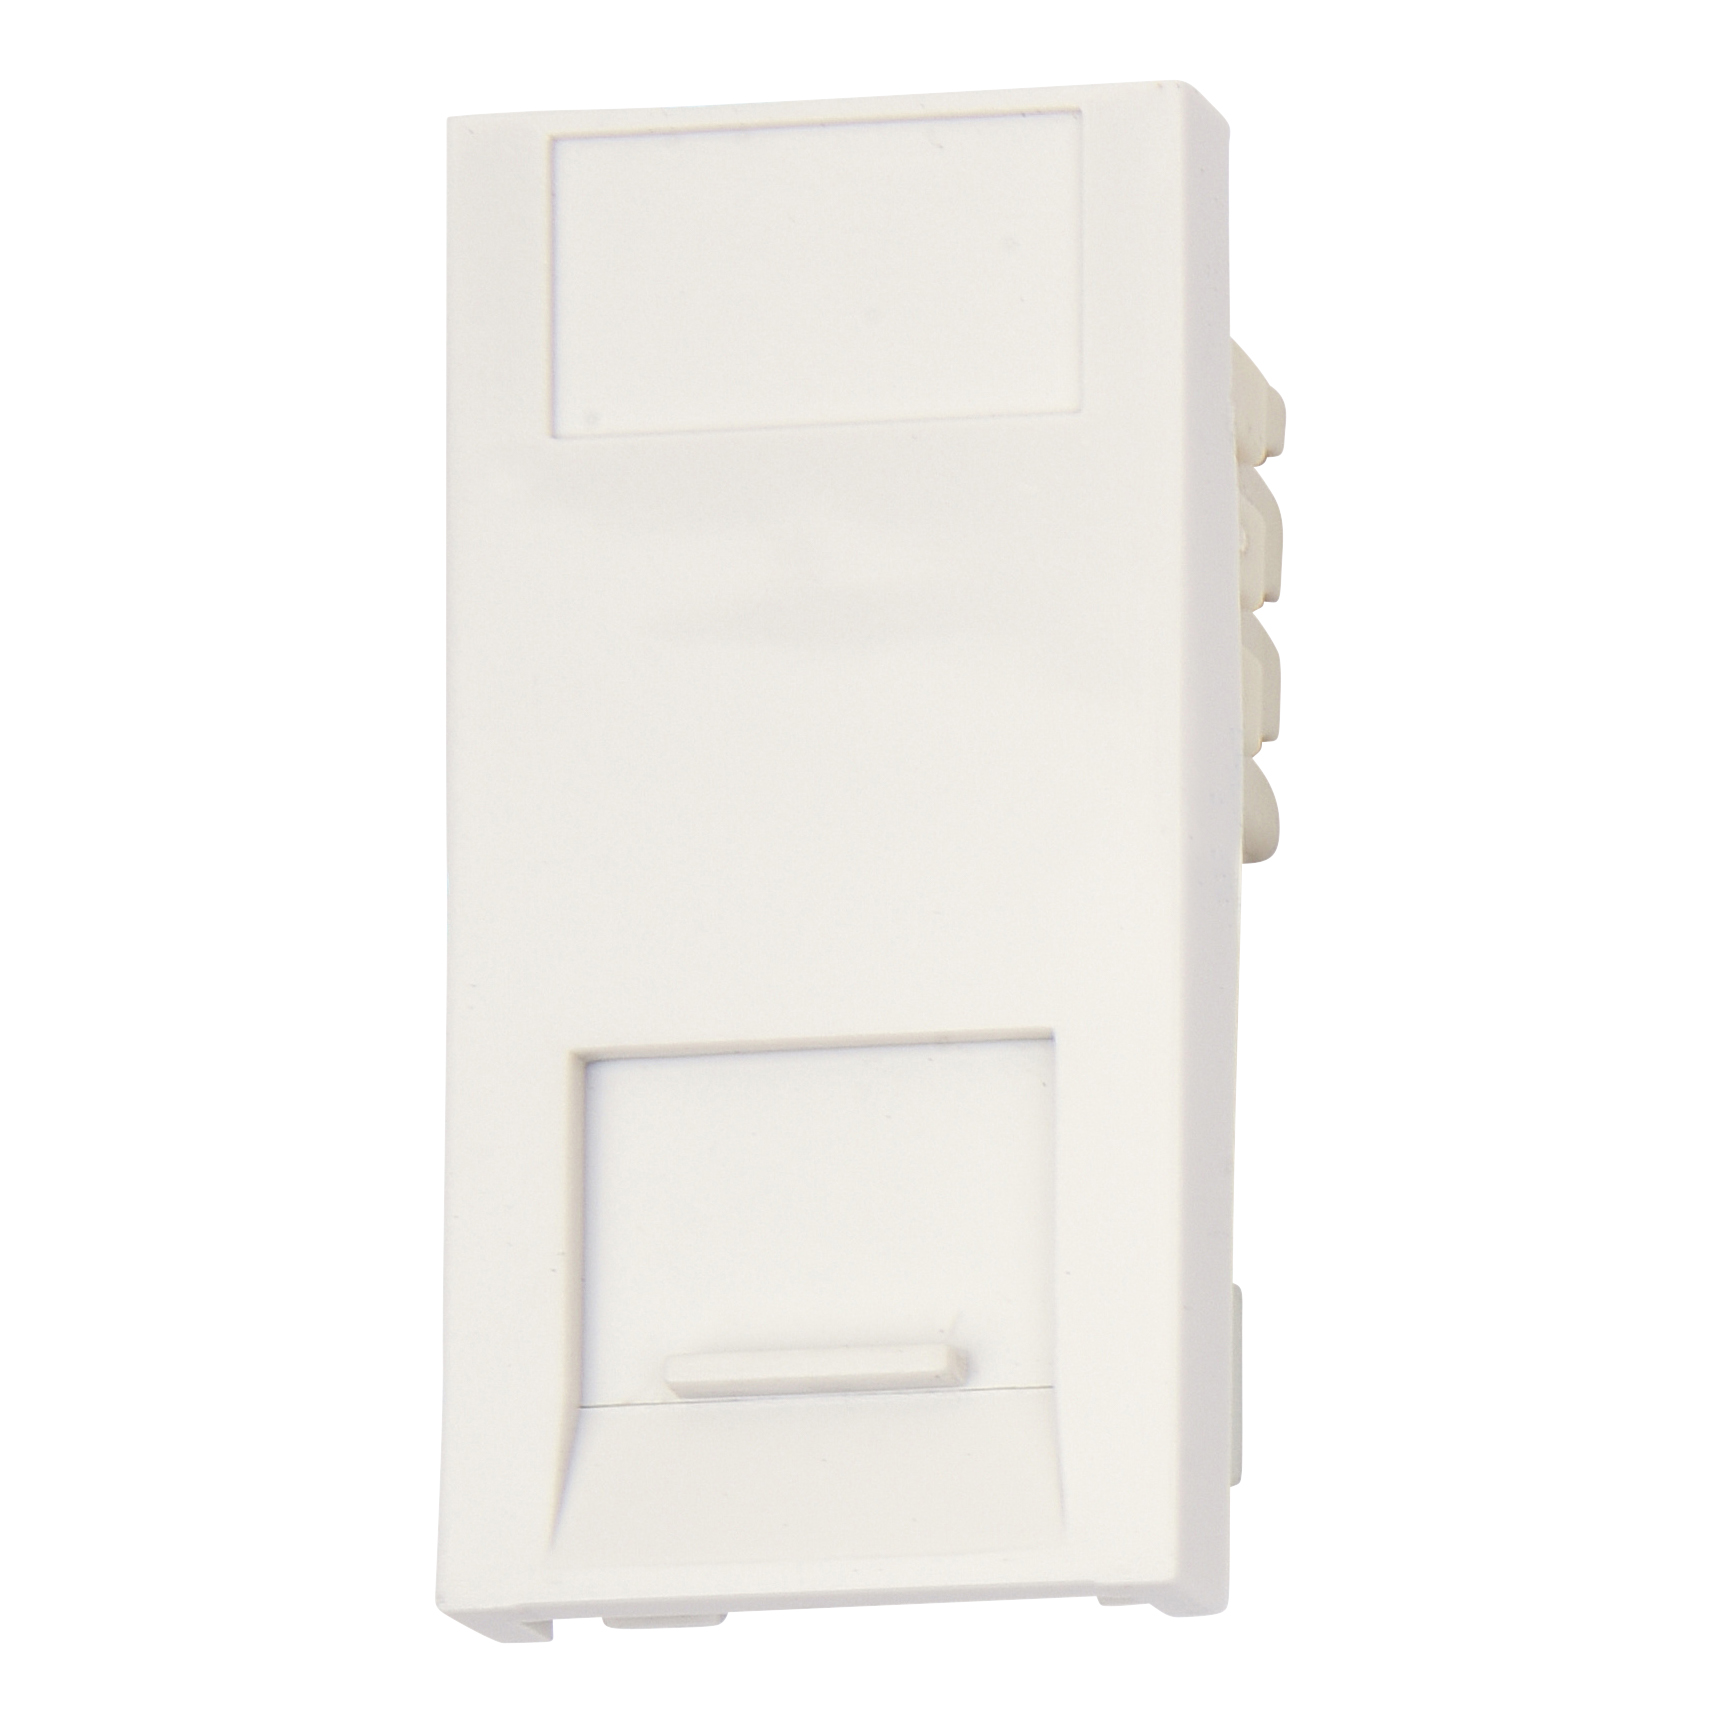 Deta Telephone Secondary Module - White)